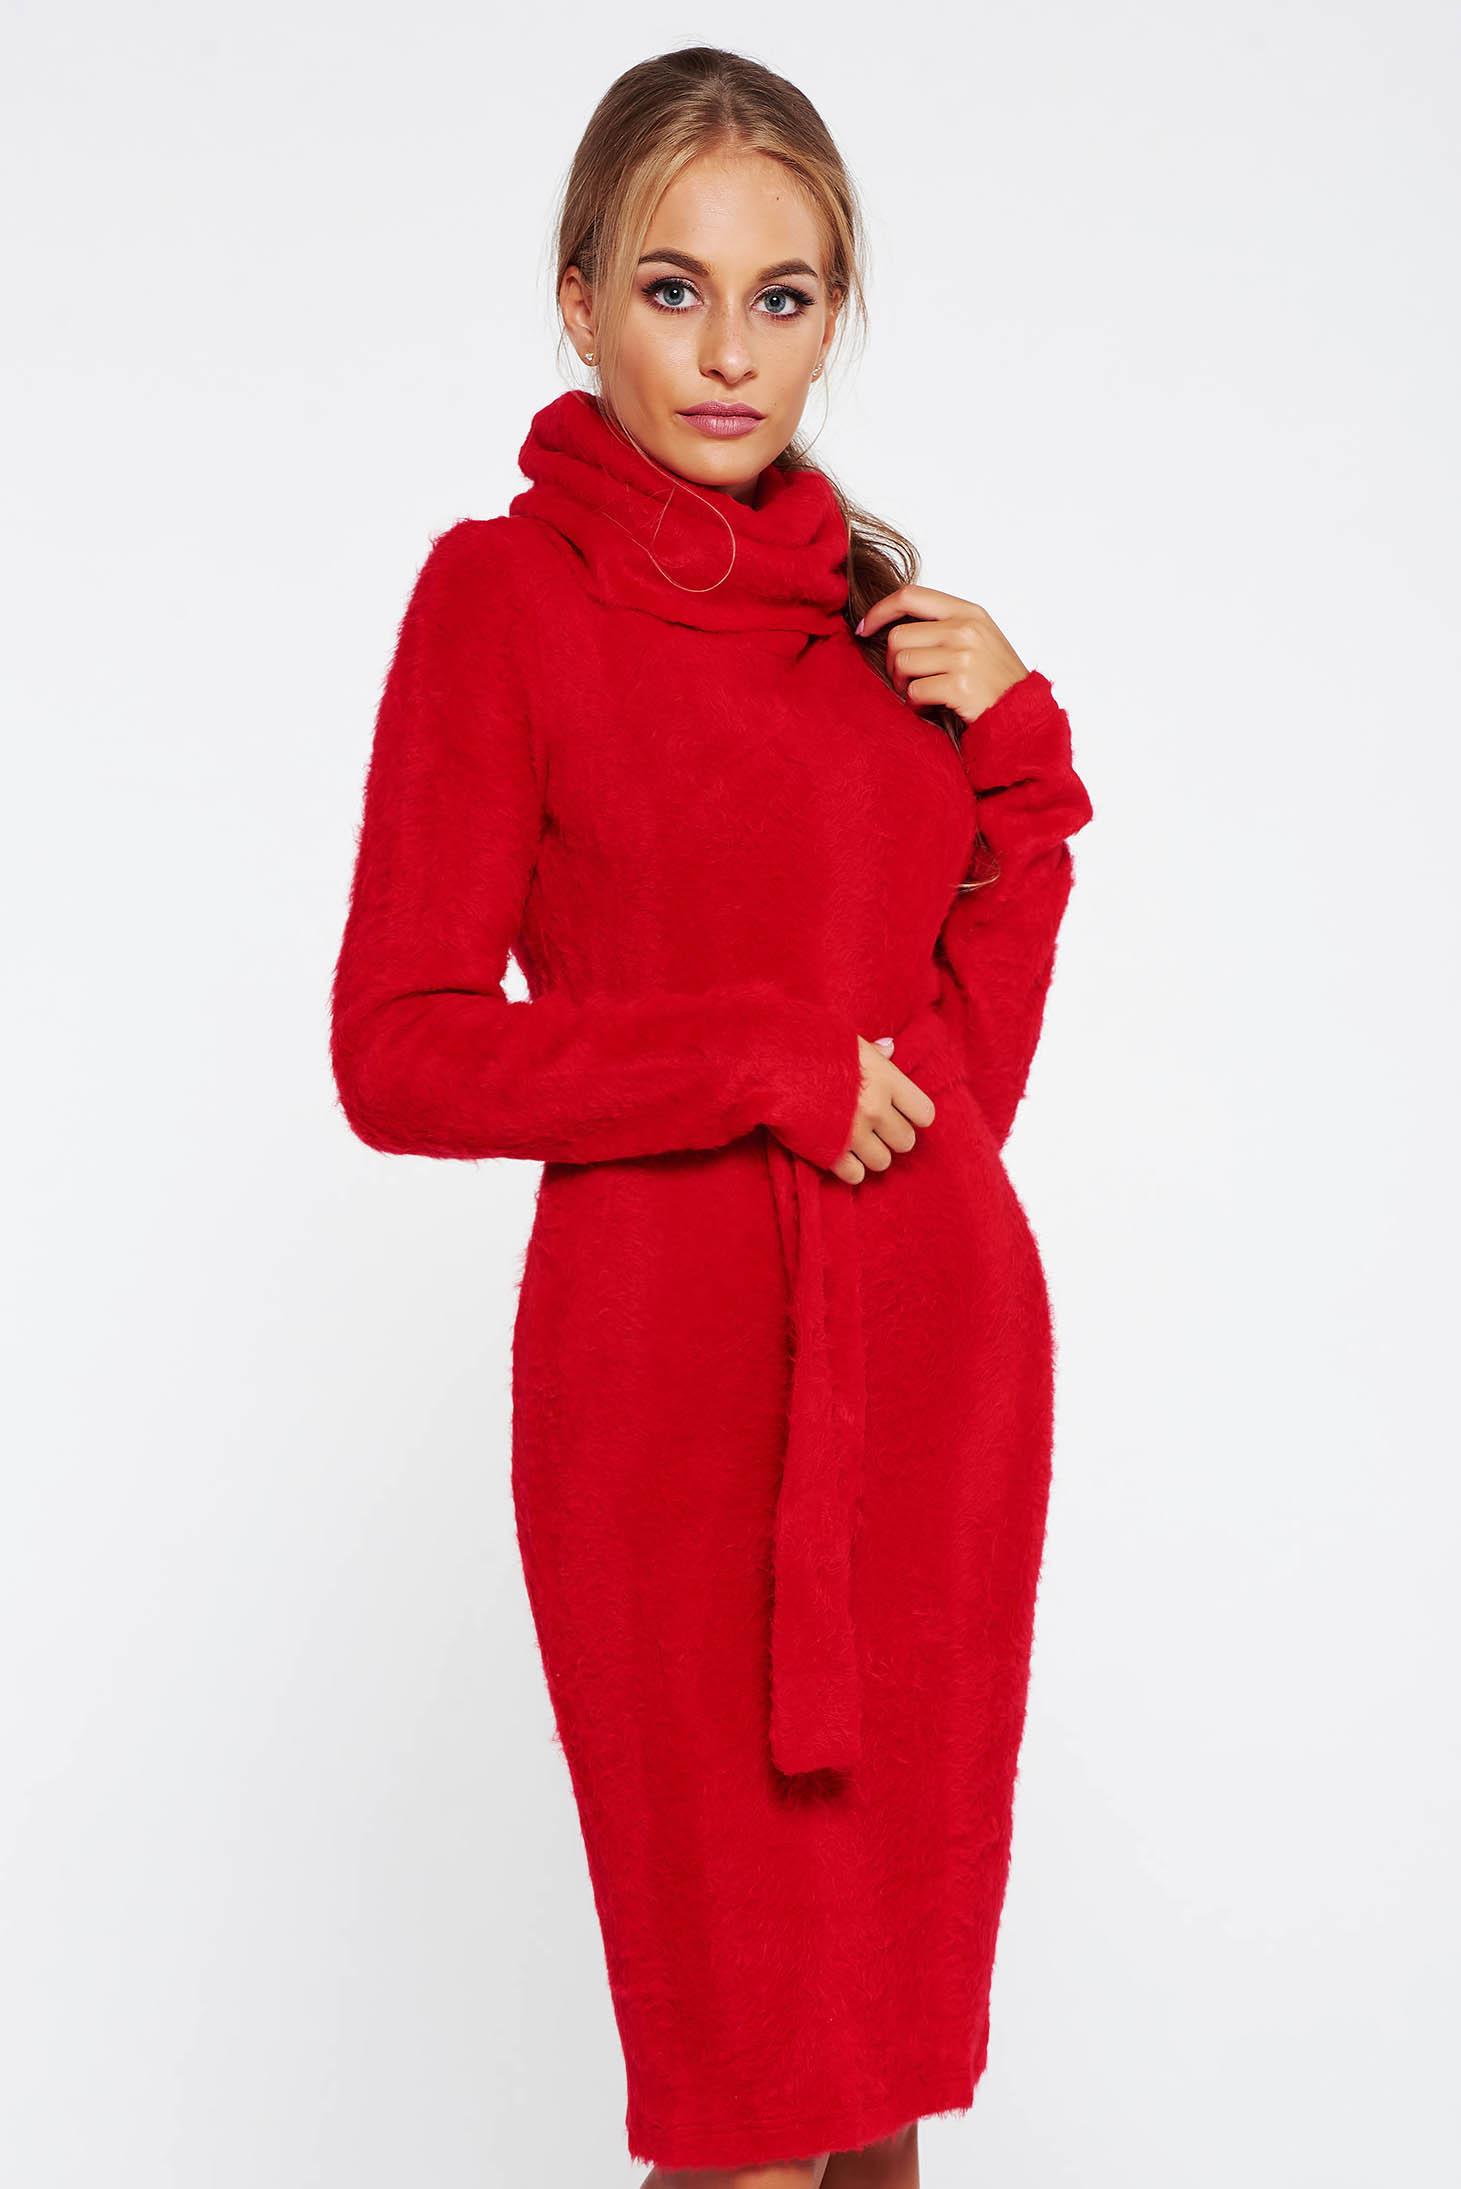 ad2fba2605 Piros PrettyGirl magasnyakú hétköznapi kötött ruha puffos anyag